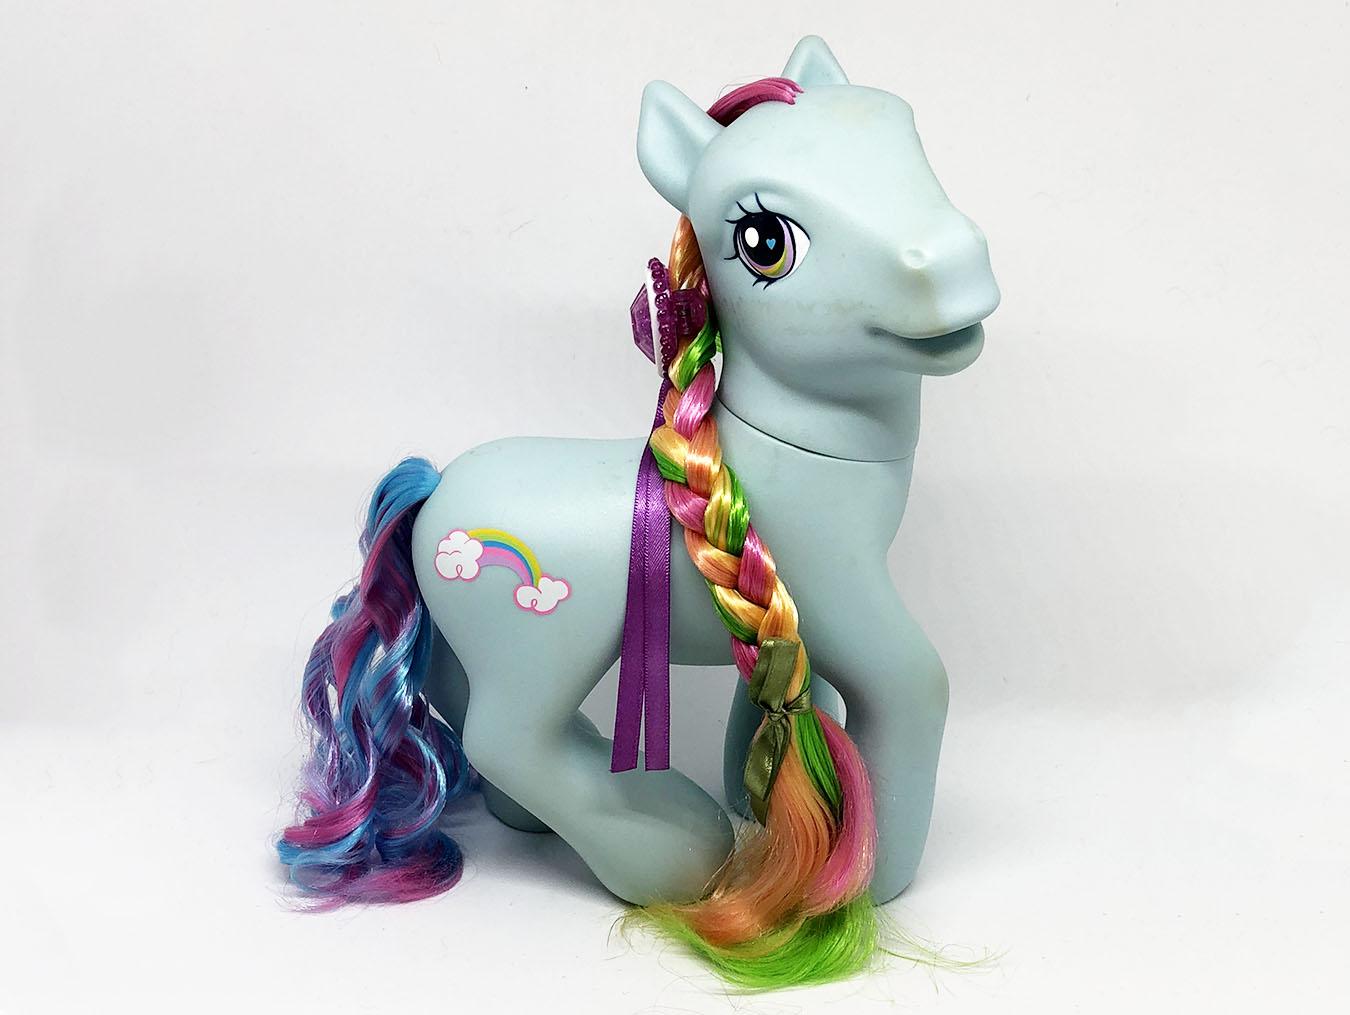 Rainbow Dash (Styling)